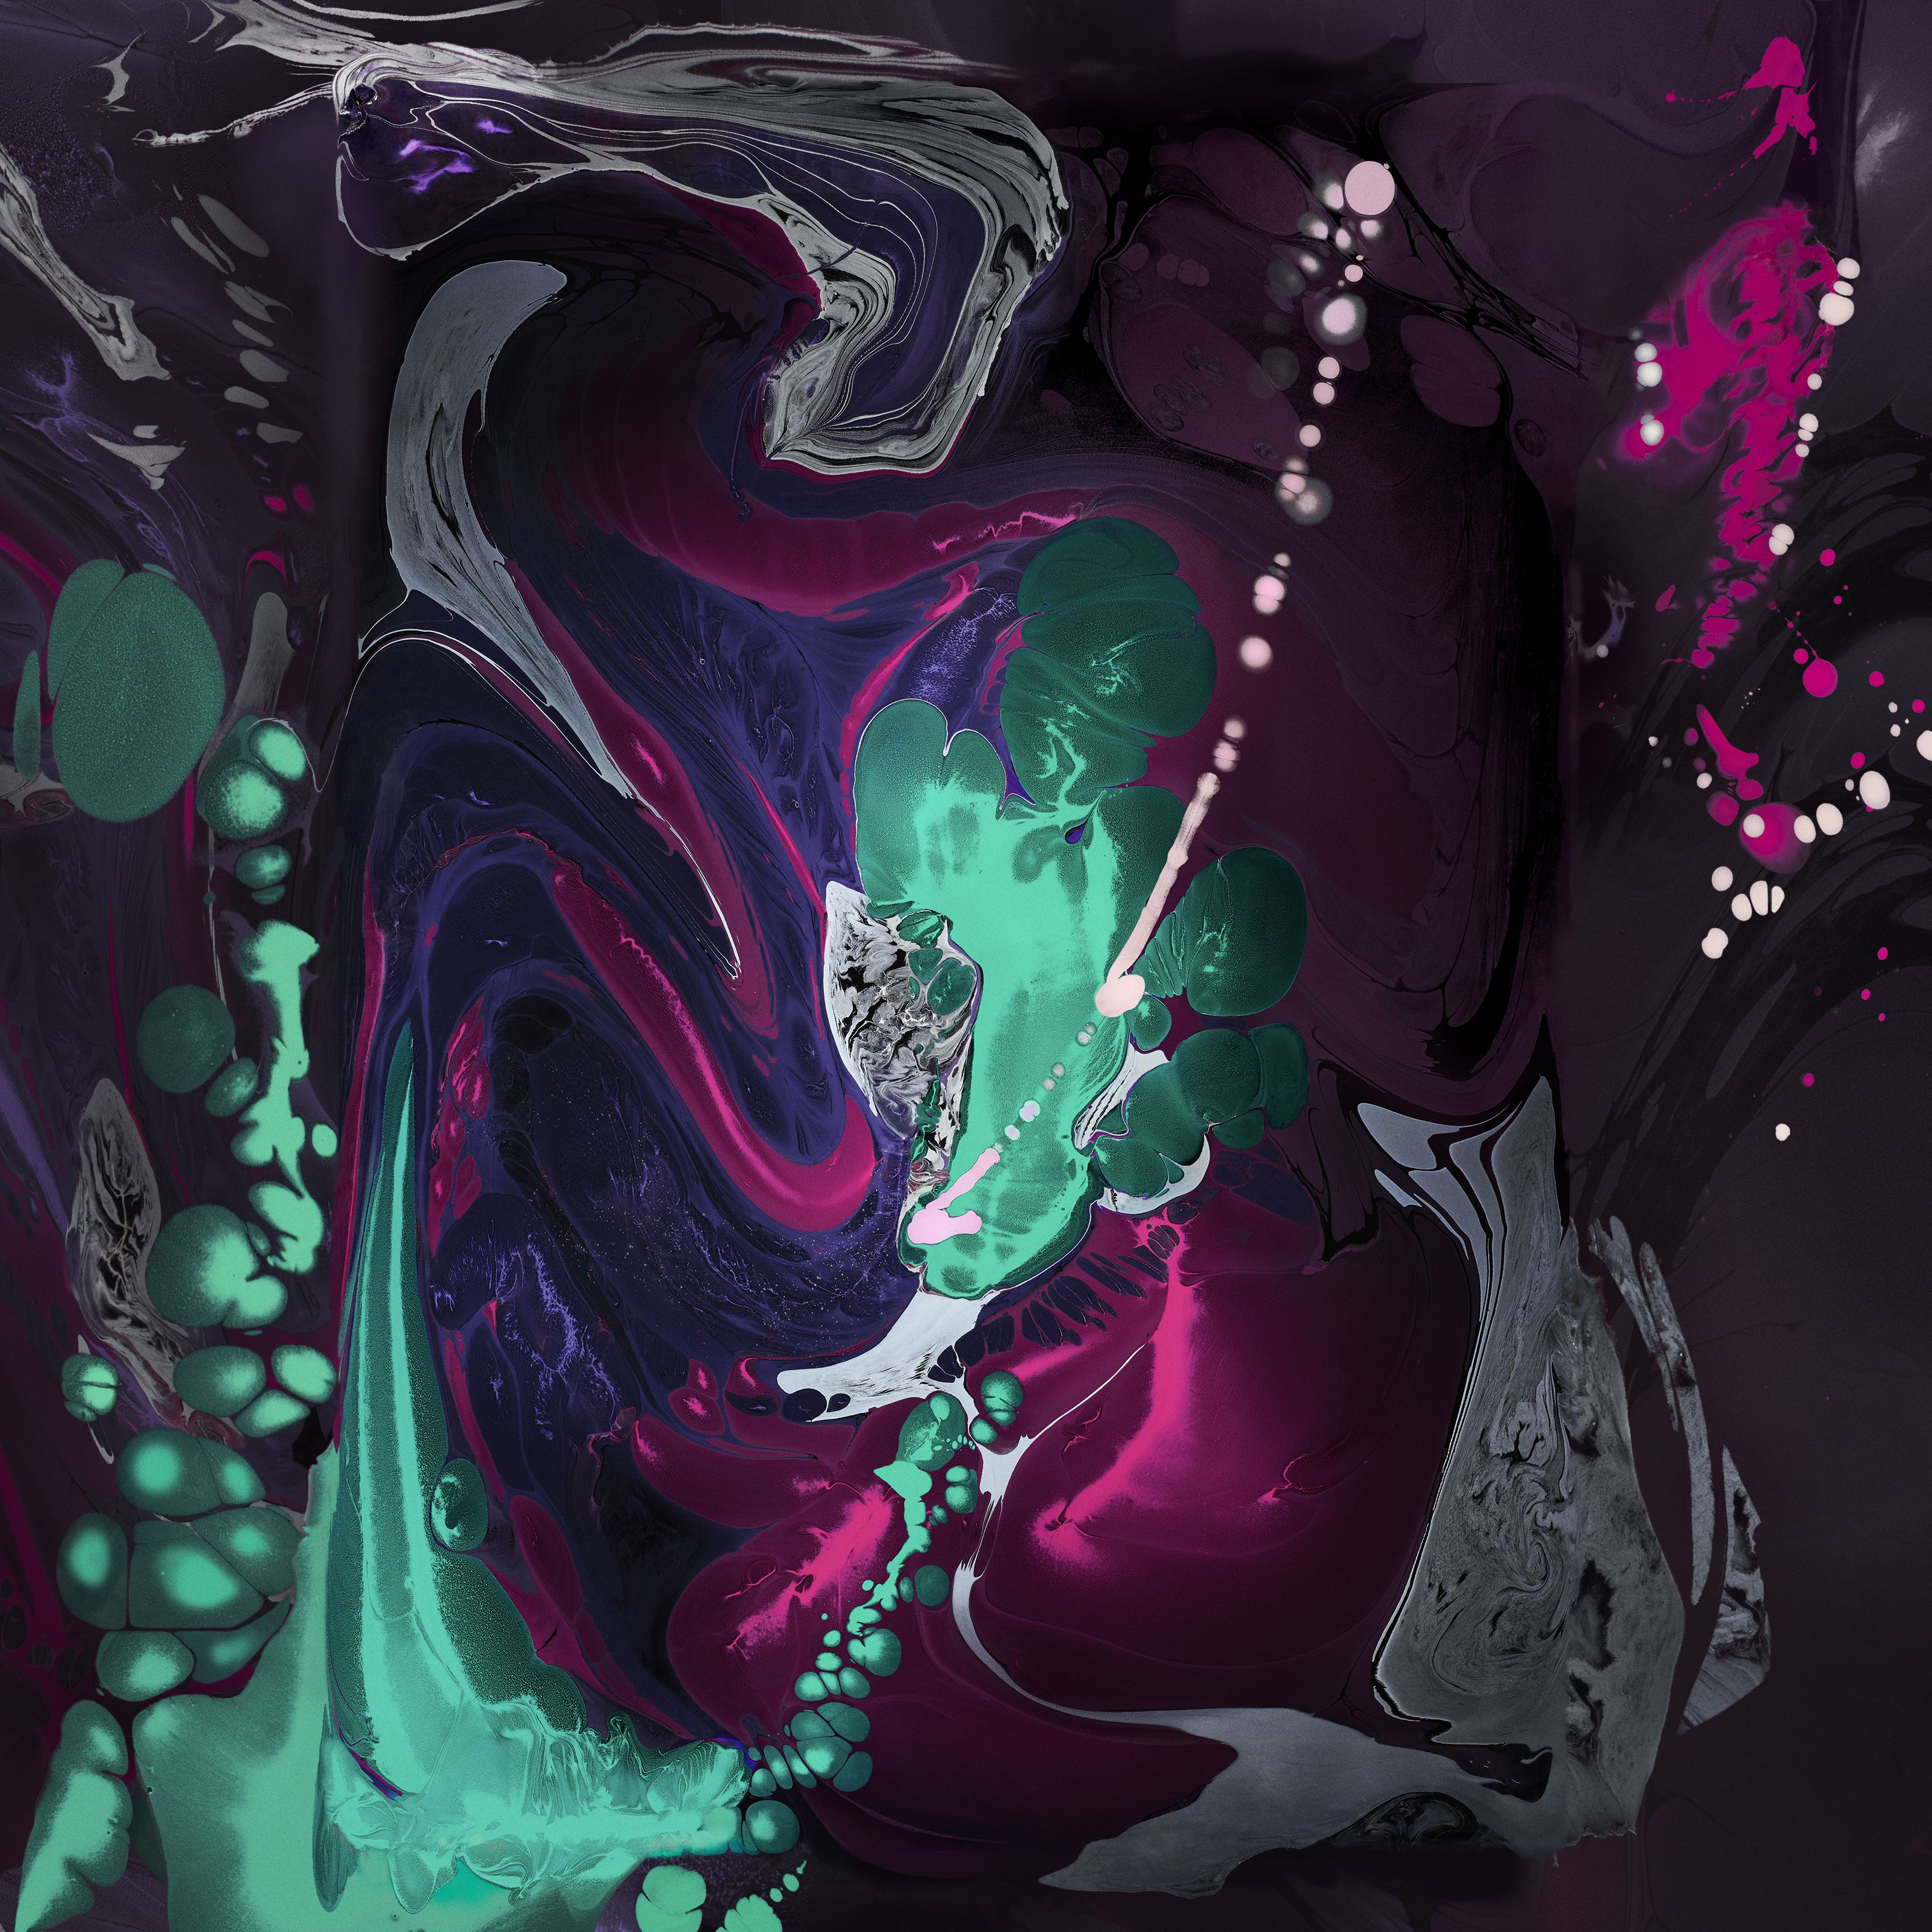 Download 8 Colourful New Ipad Pro Wallpapers Right Here Ultralinx Ipad Pro Wallpaper Ipad Pro Wallpaper Hd Ipad Pro